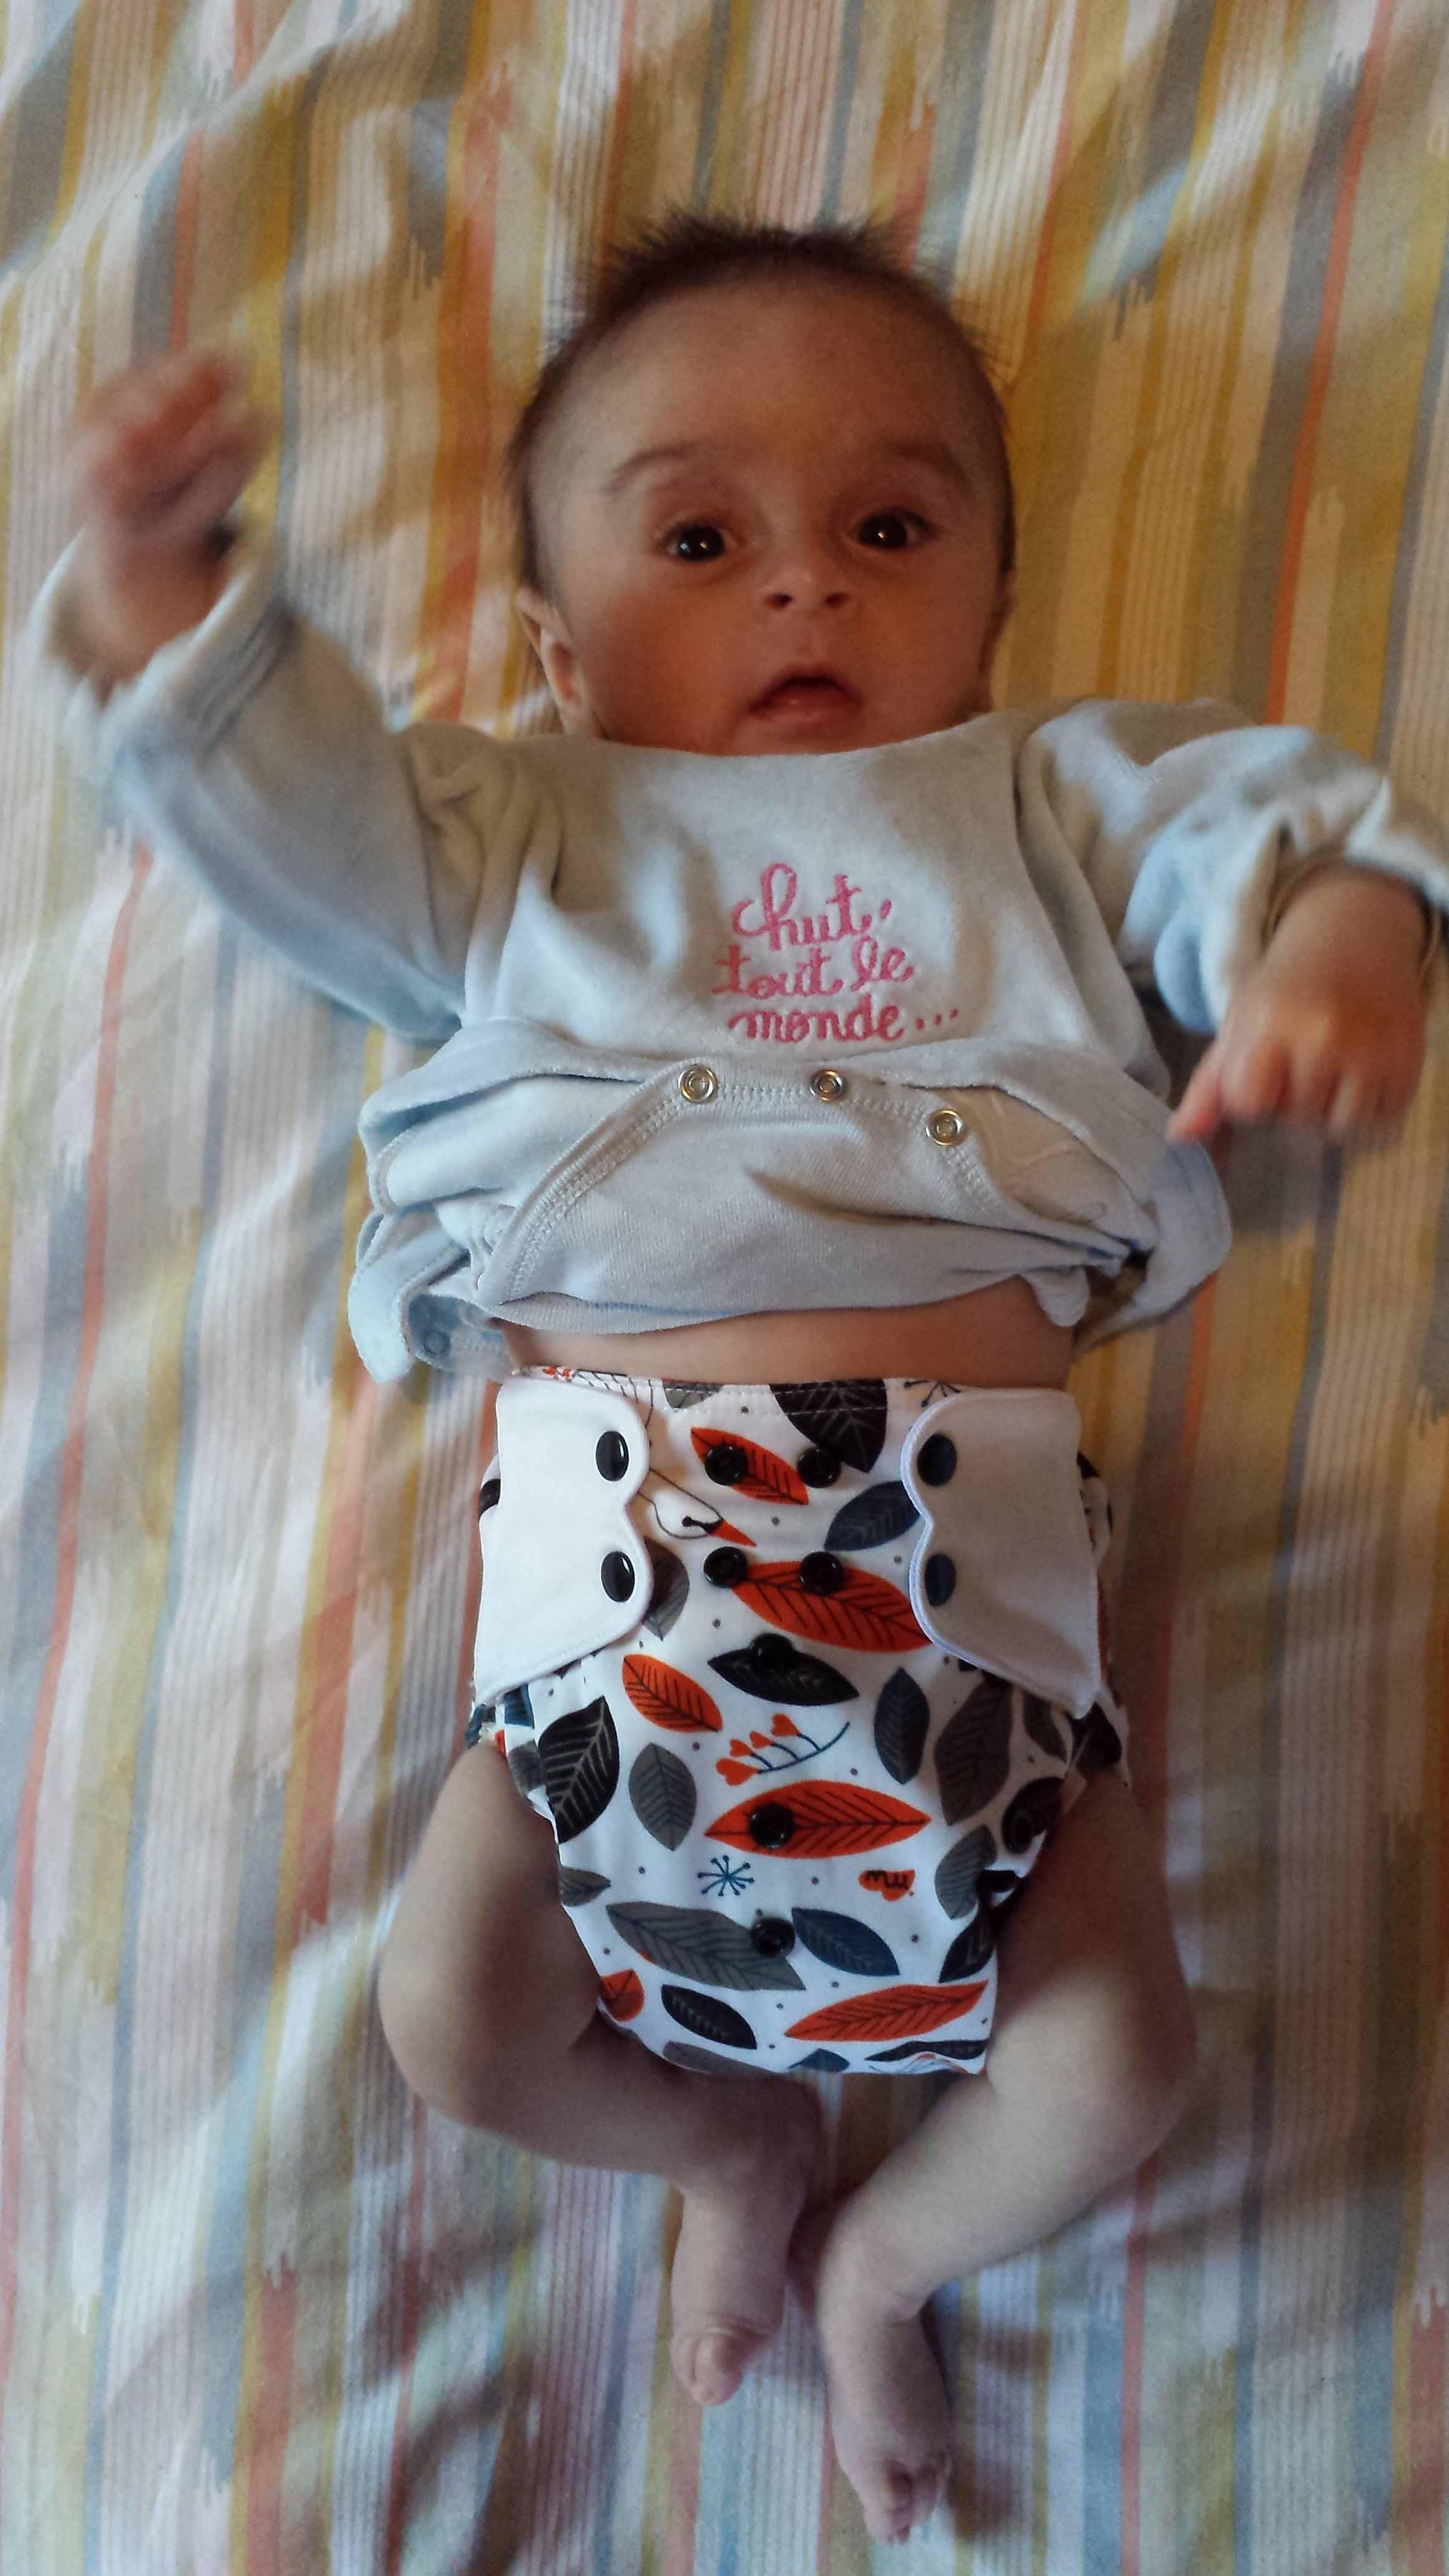 couche lavables bambinex + culotte imperméable baby wizard